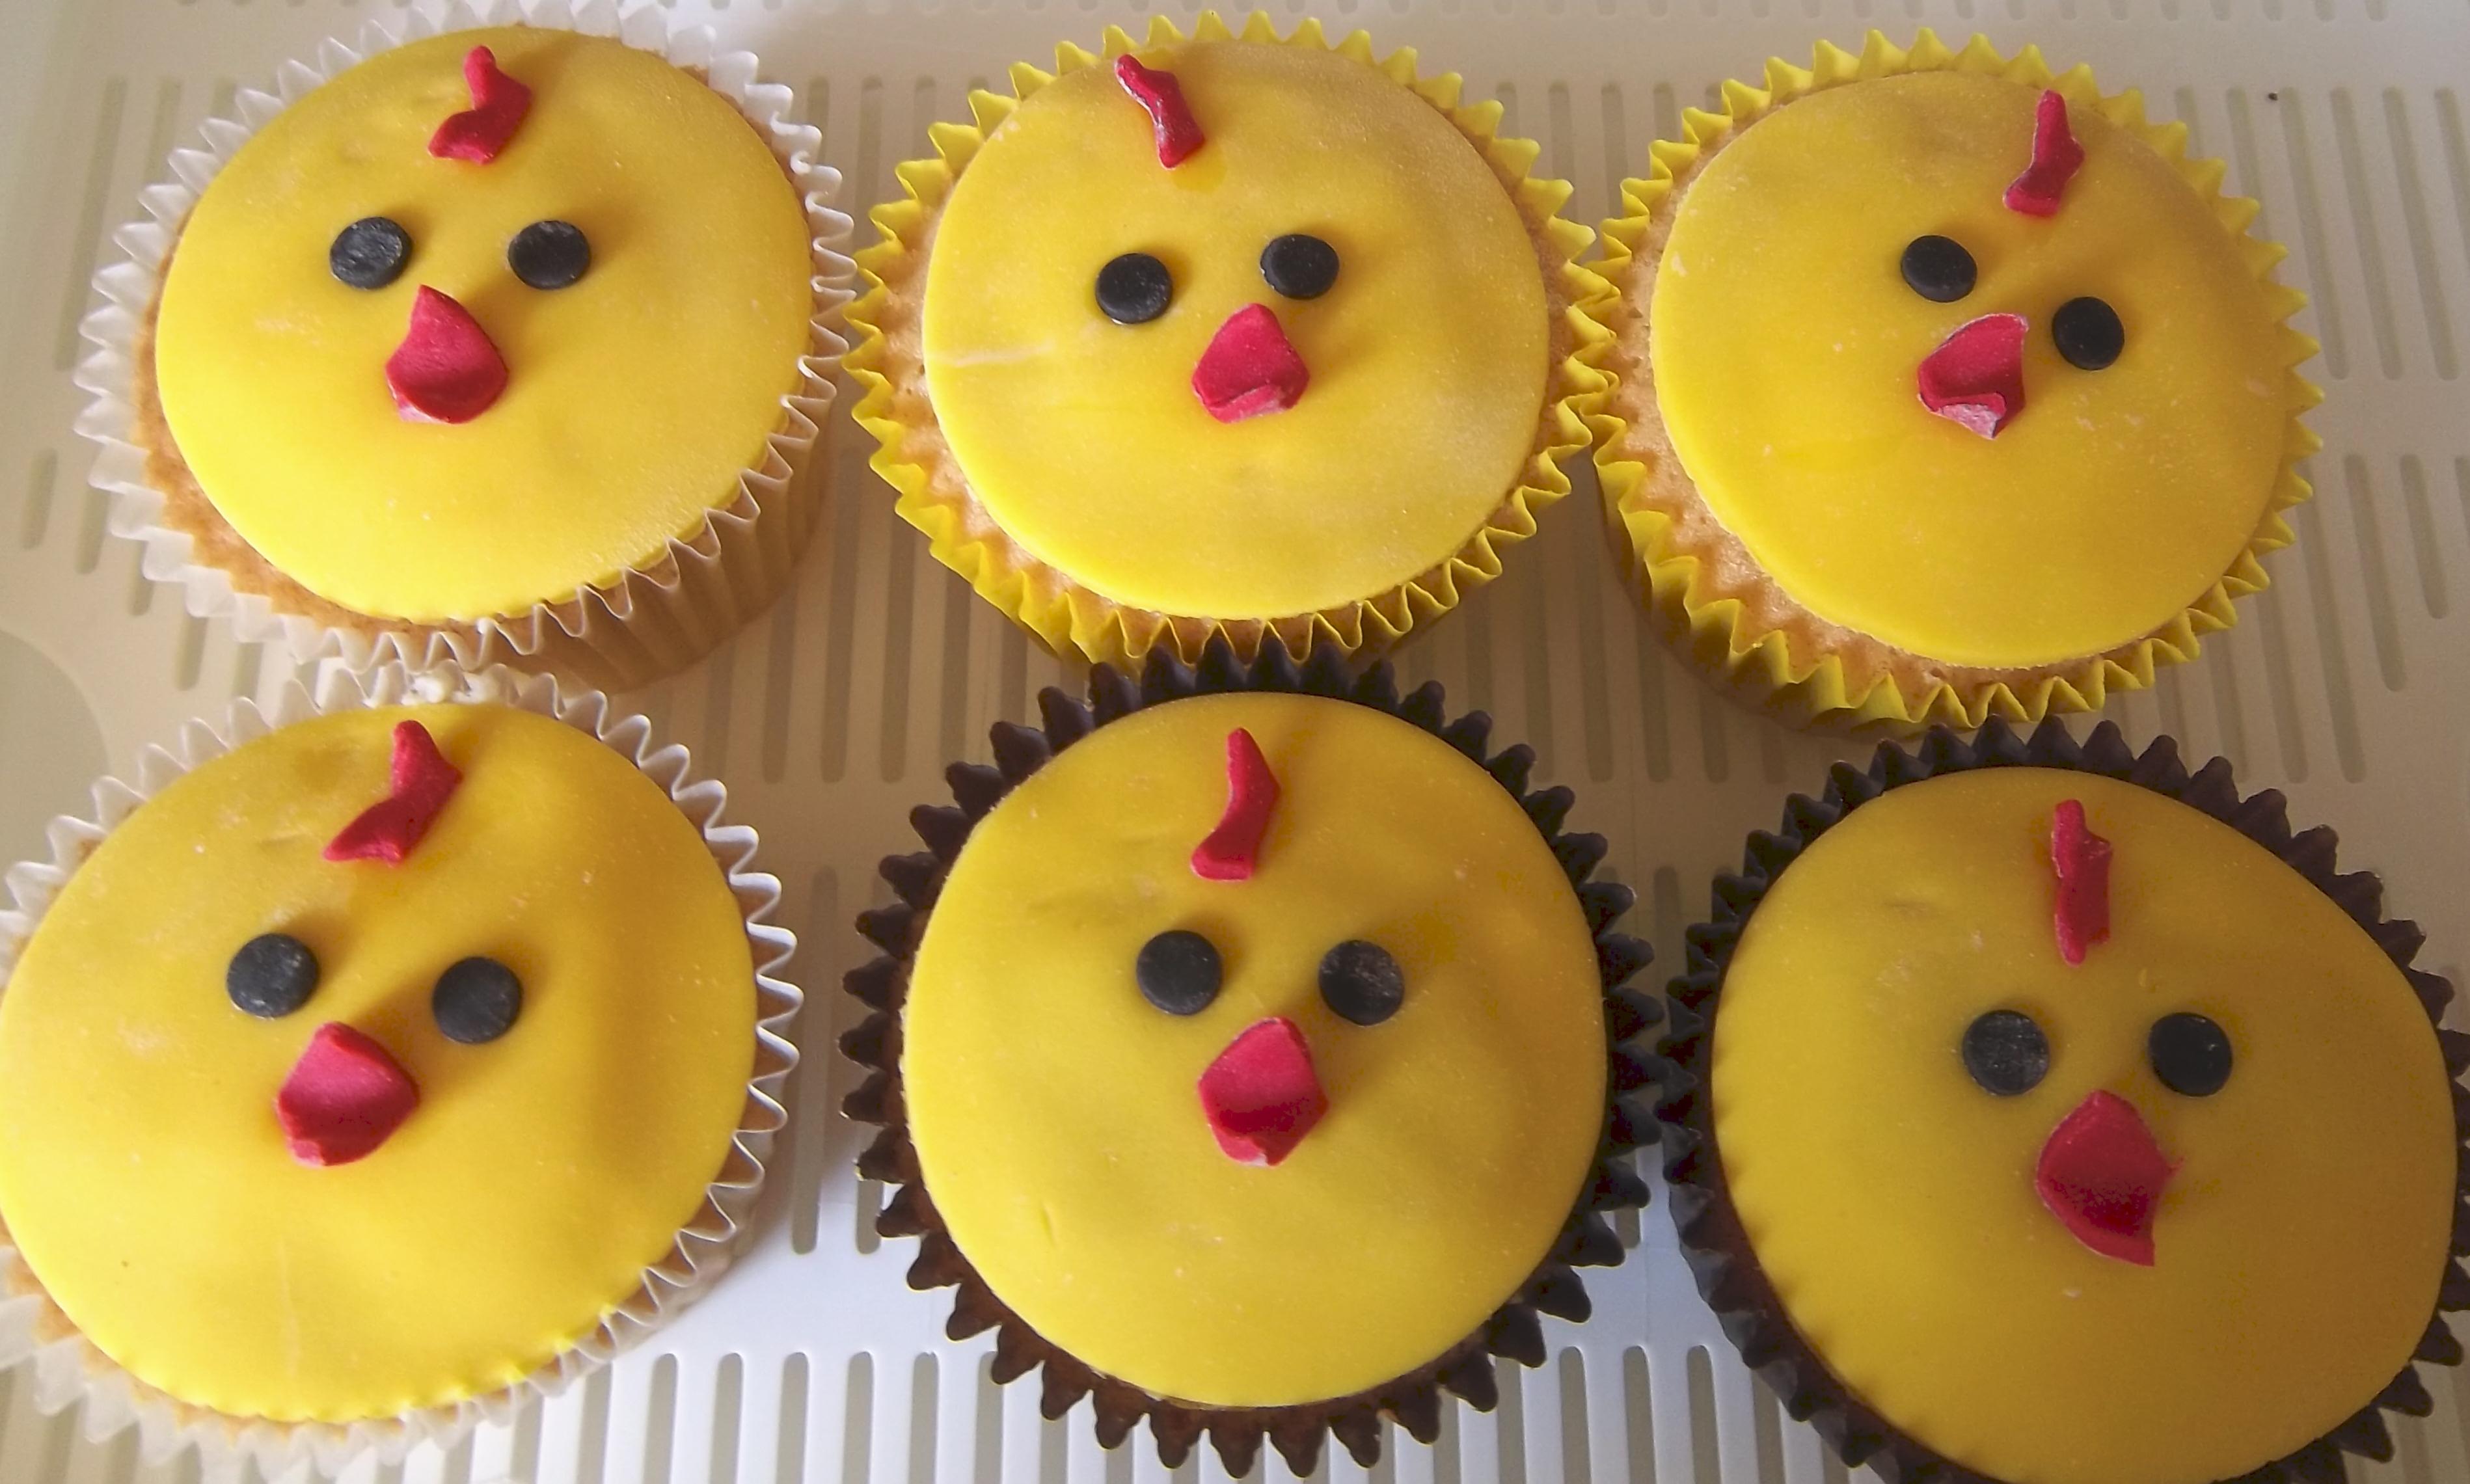 Wedding Cake And Cupcakes Design